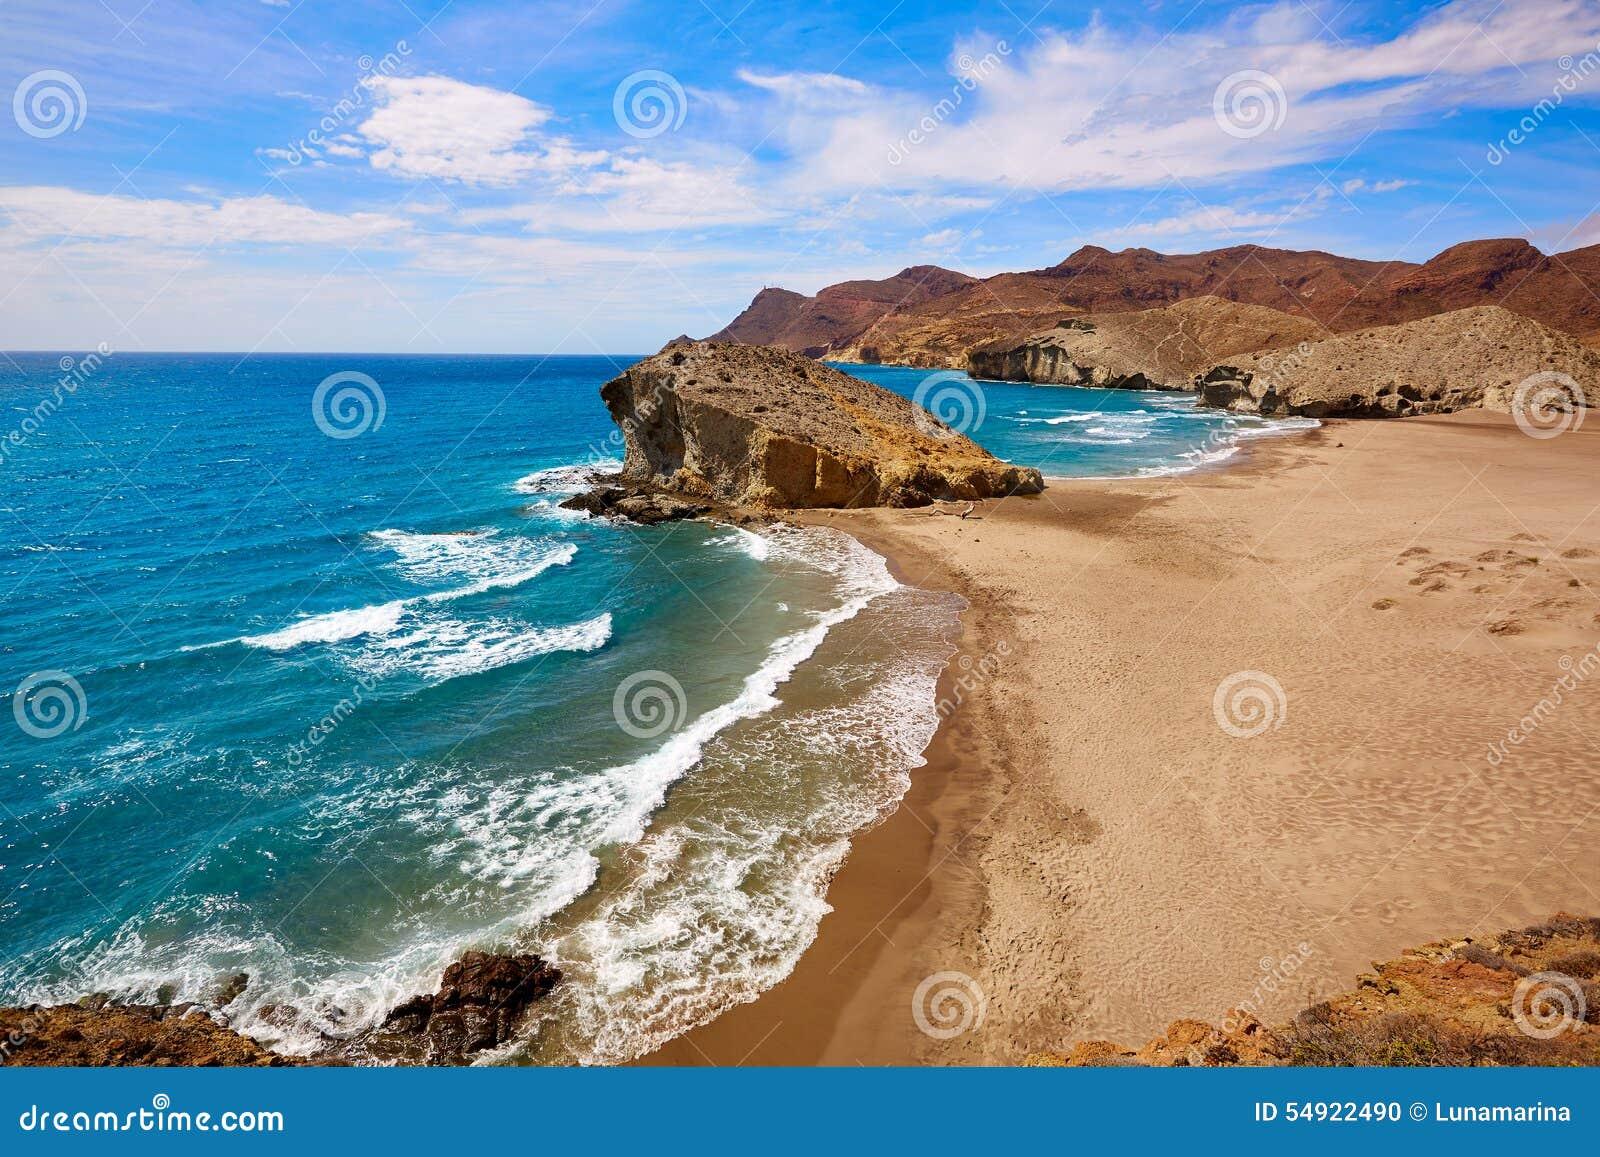 Almeria playa del monsul beach at cabo de gata stock photo for Cabo de gata spain